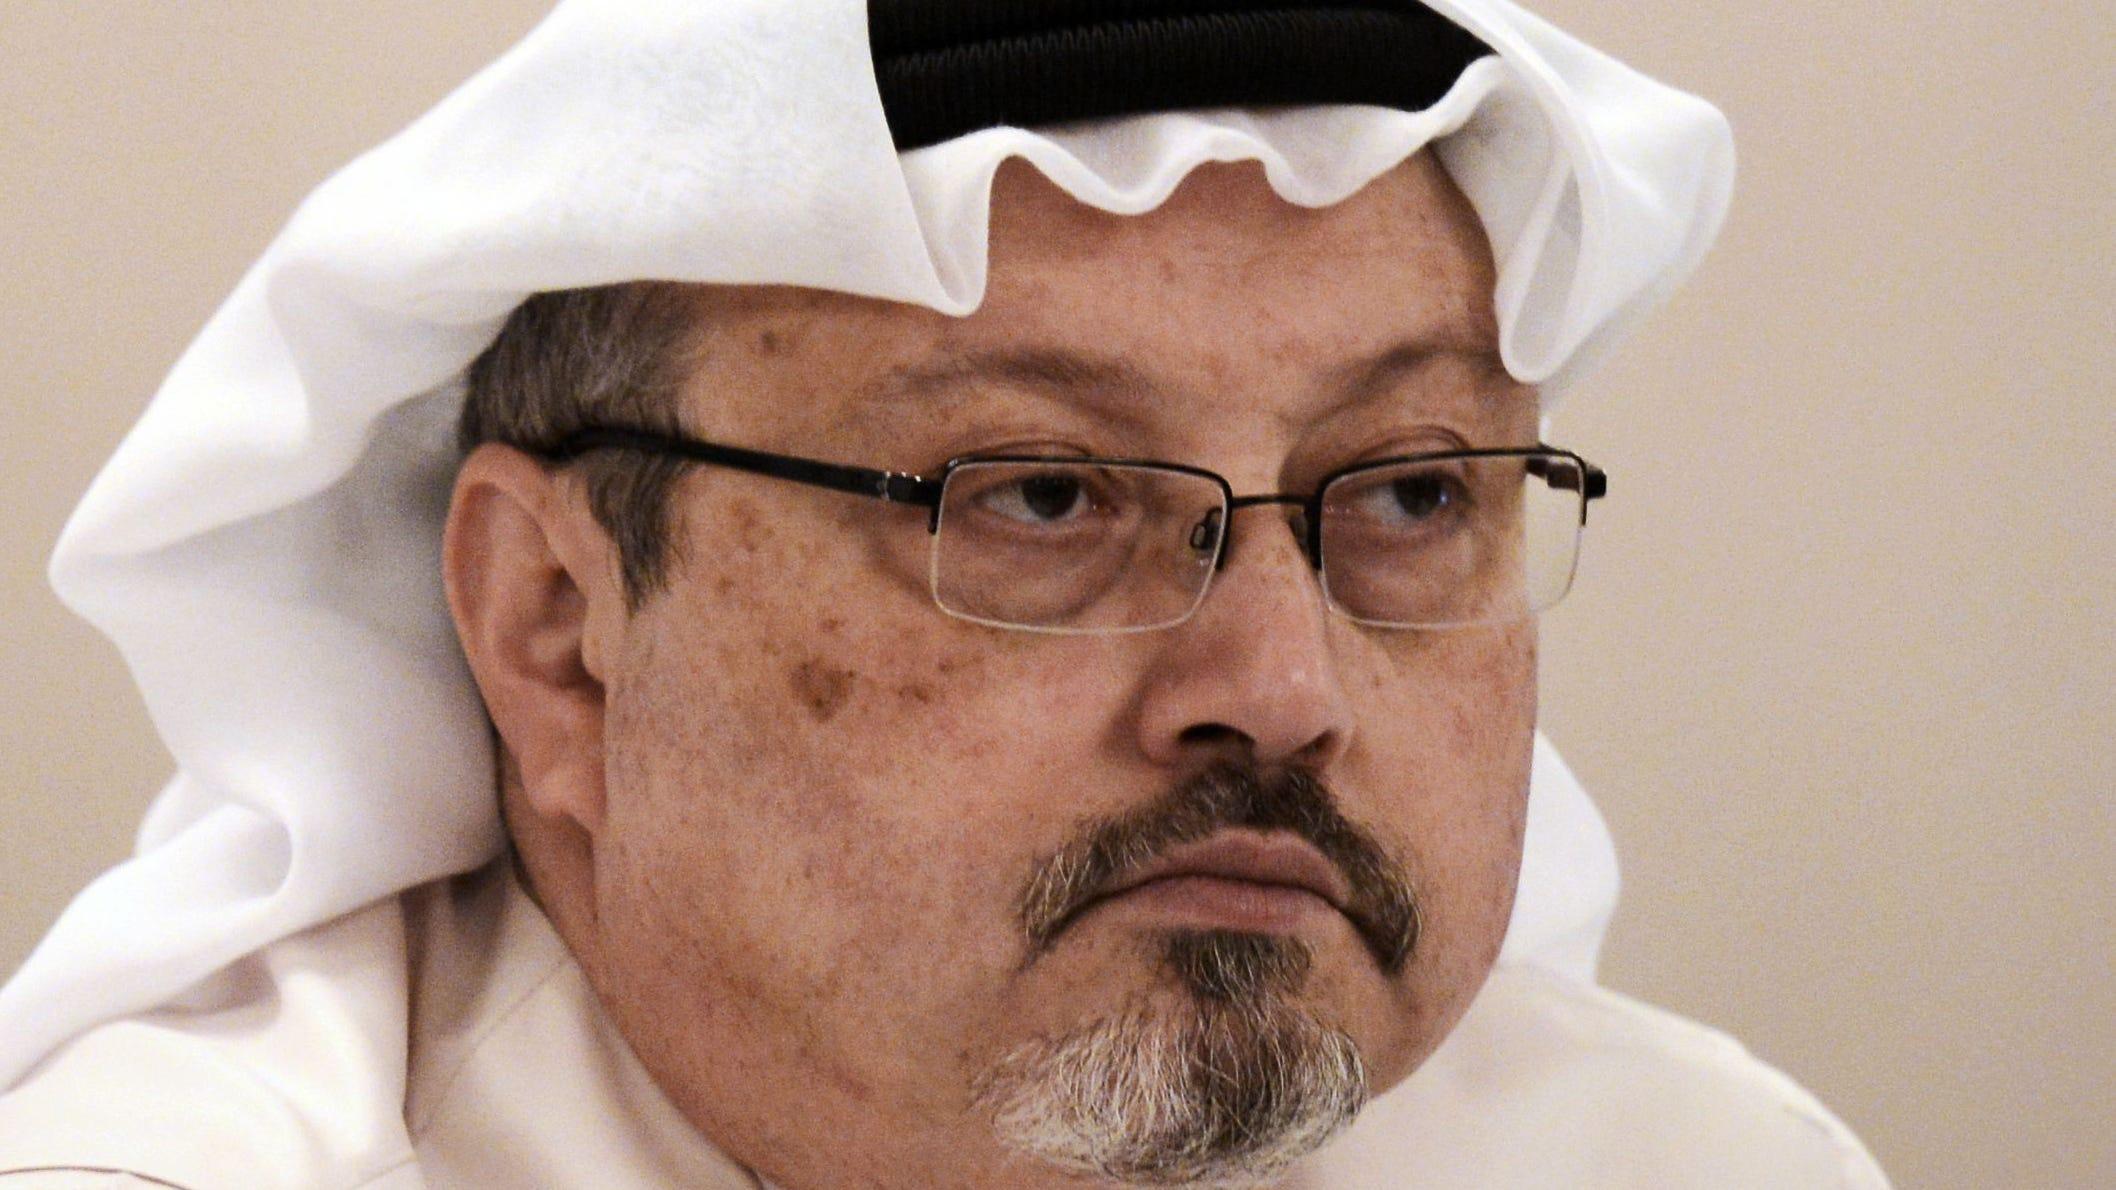 Saudi Arabia claims journalist Jamal Khashoggi died after 'brawl' inside consulate